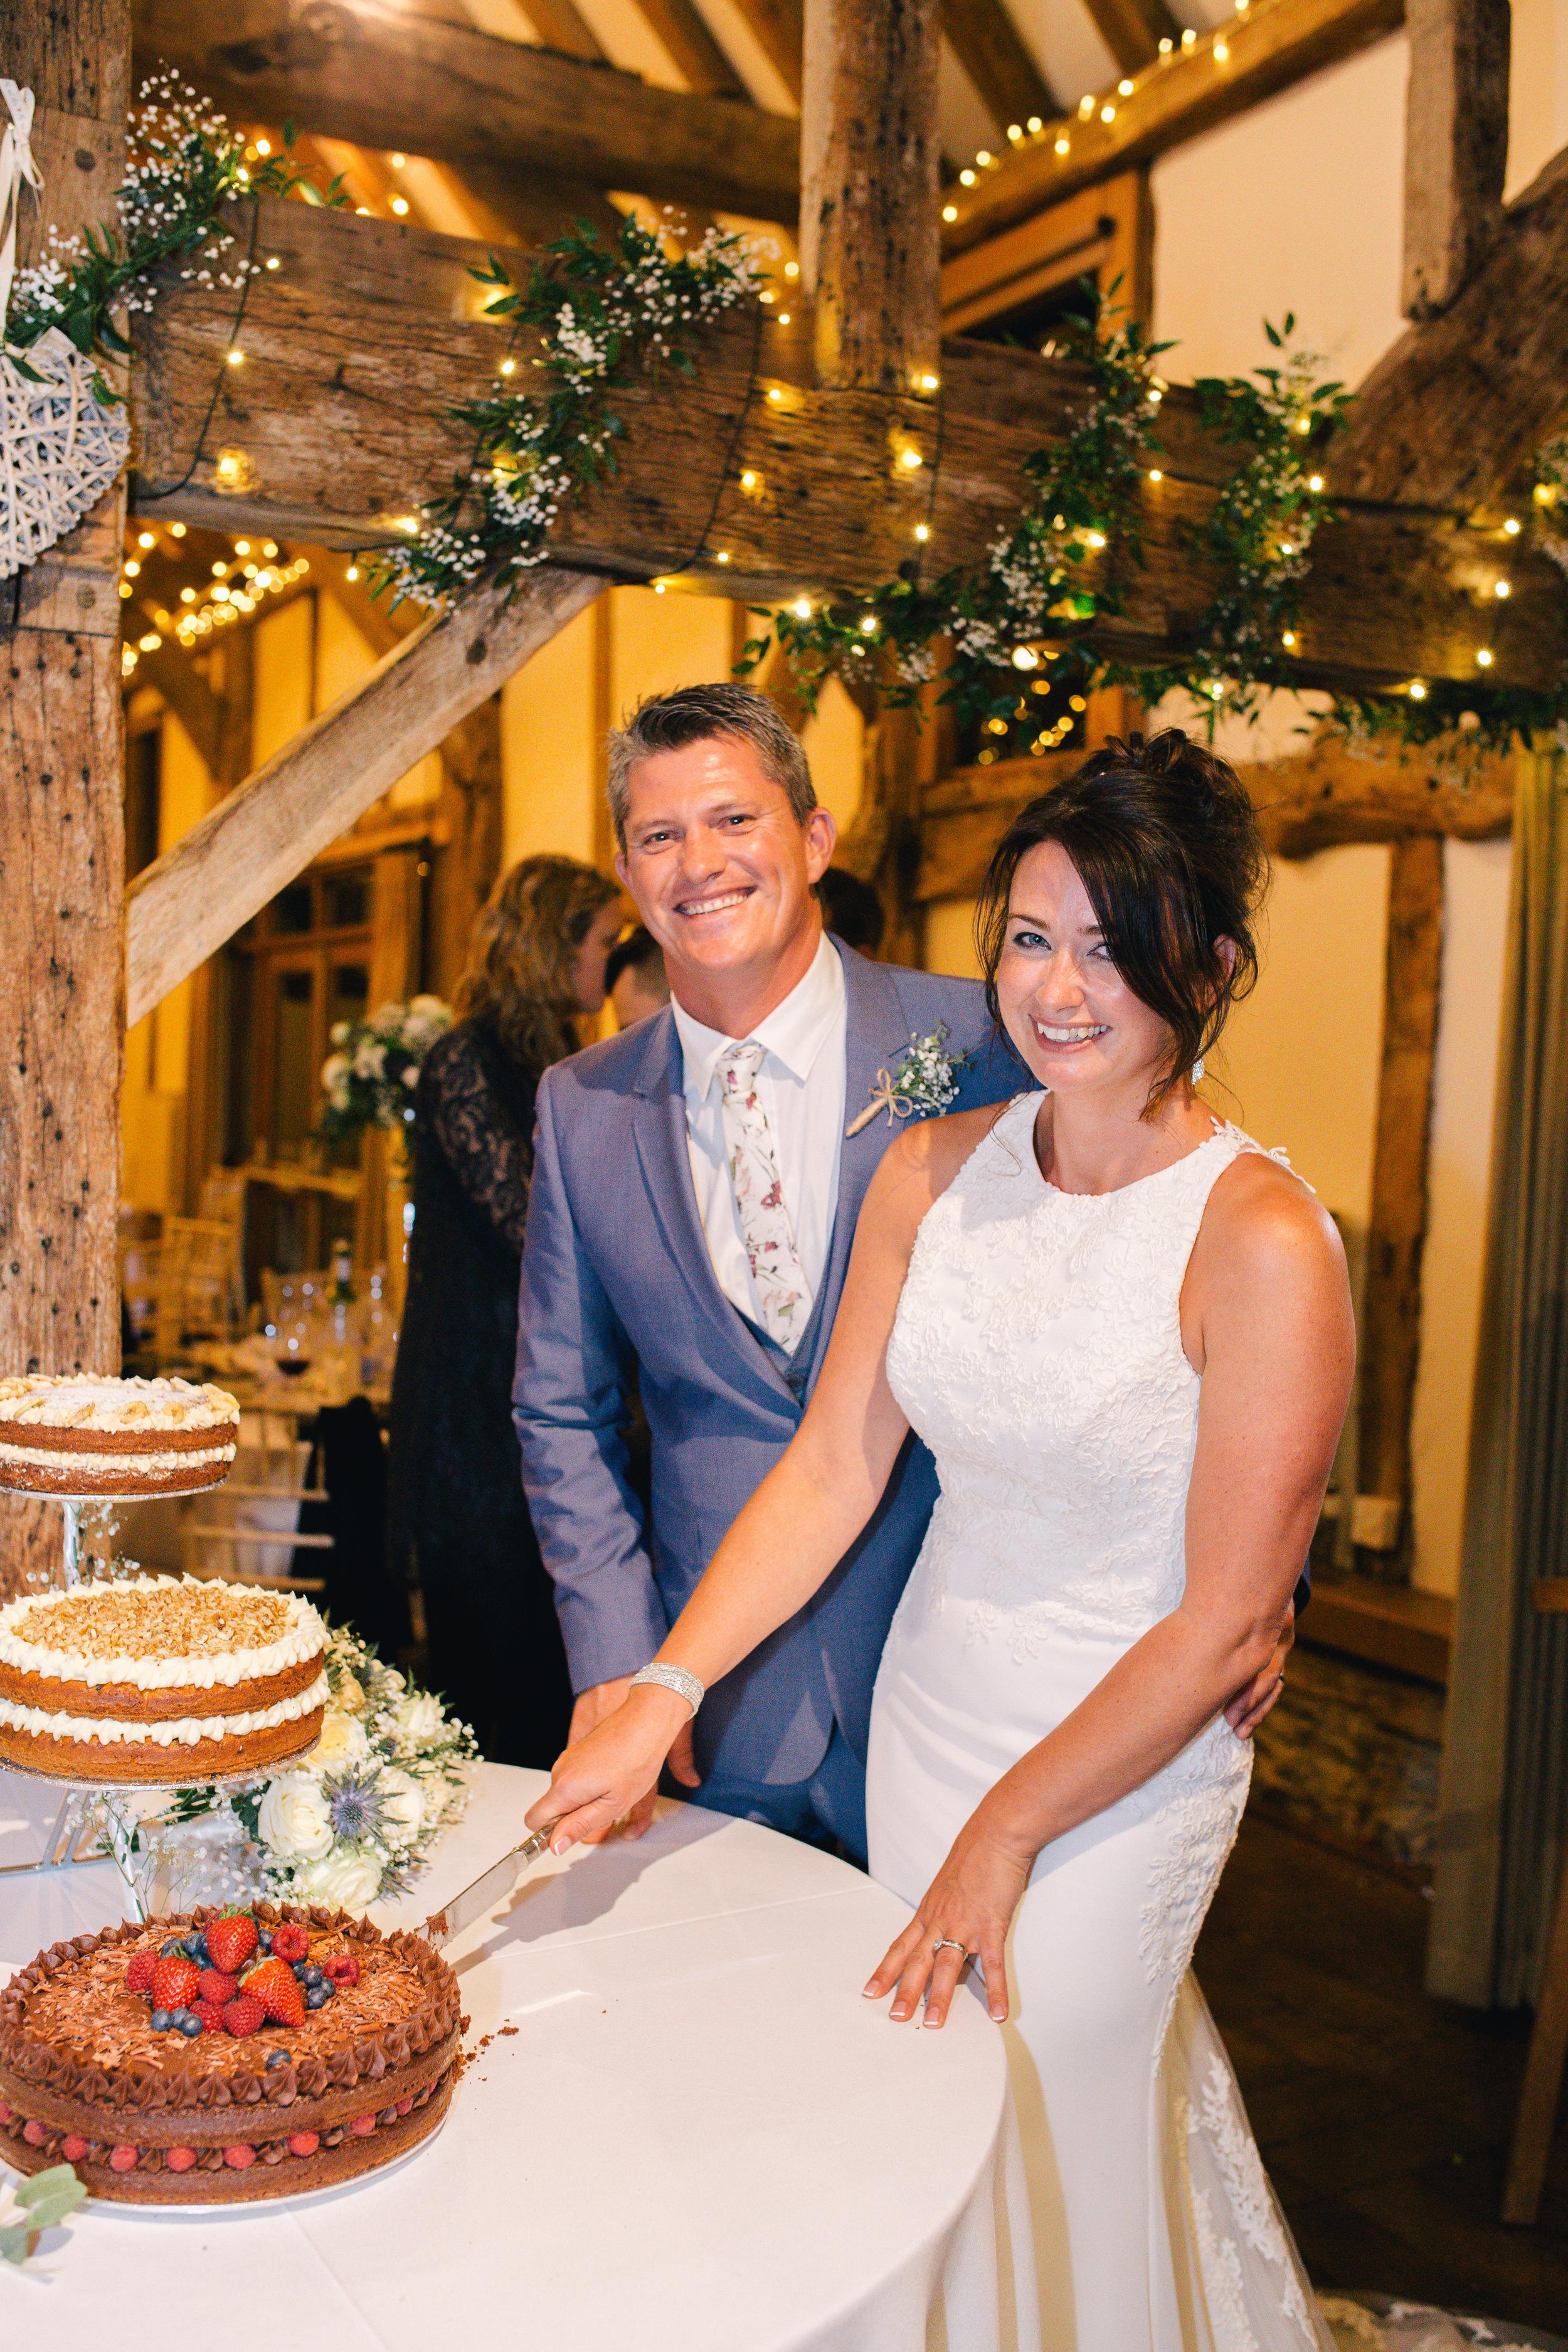 55-lucy james loseley park wedding photography laura mott-054.jpg